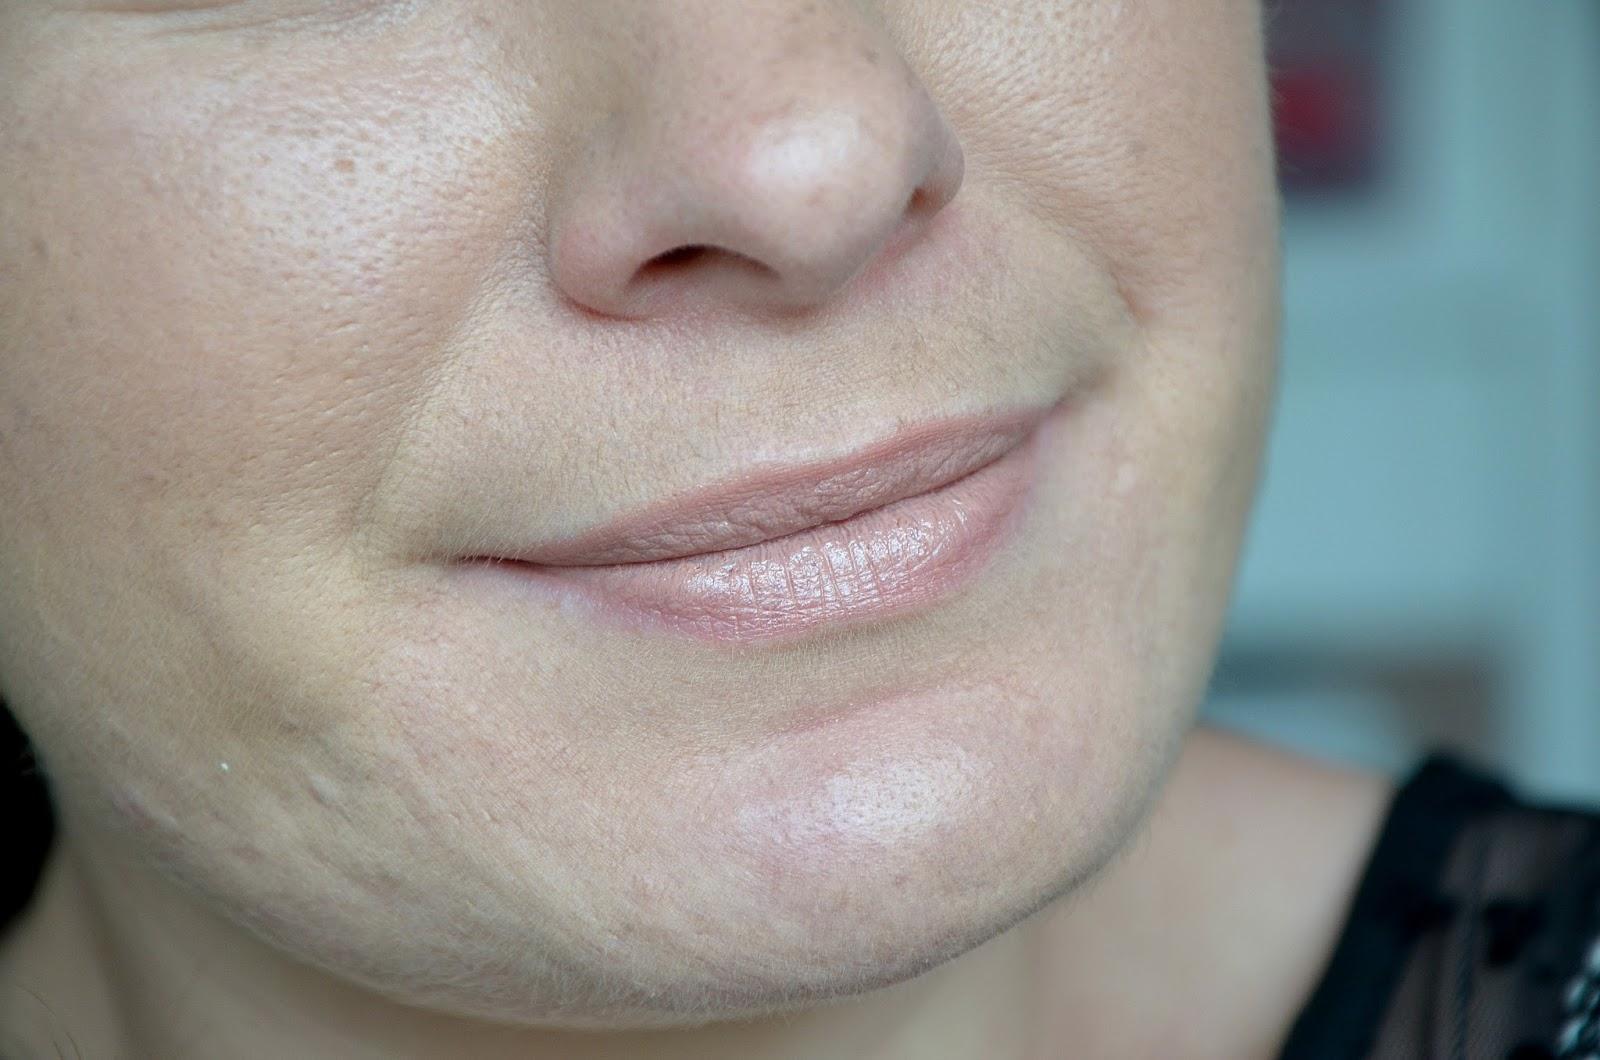 MAC X MARIE marie glaze lipstick rouge à lèvres SS17 marie lopez enjoyphoenix swatch